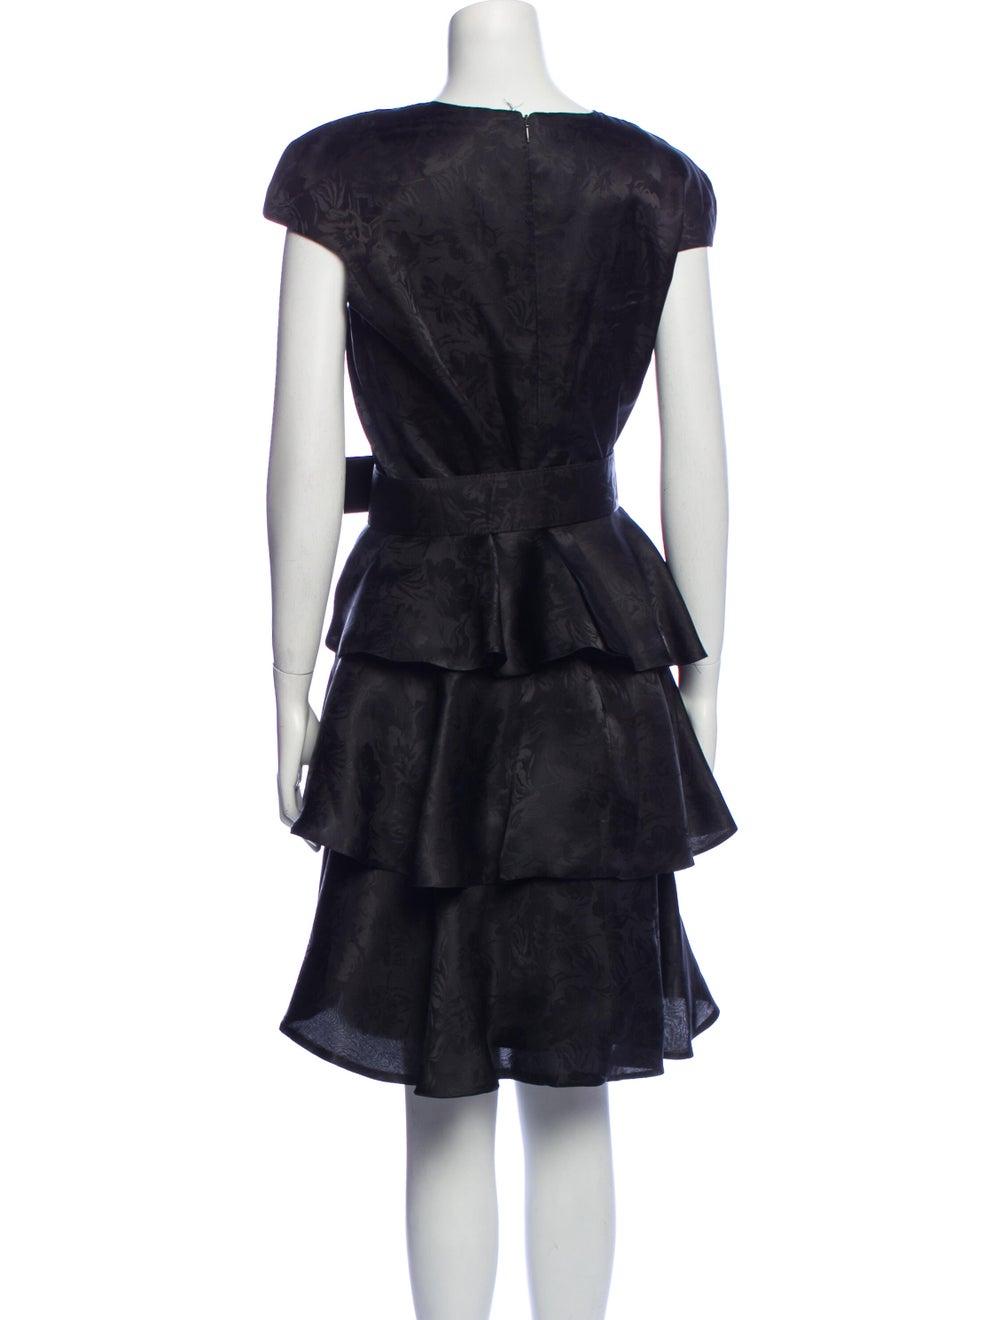 Arnold Scaasi Vintage Knee-Length Dress Black - image 3